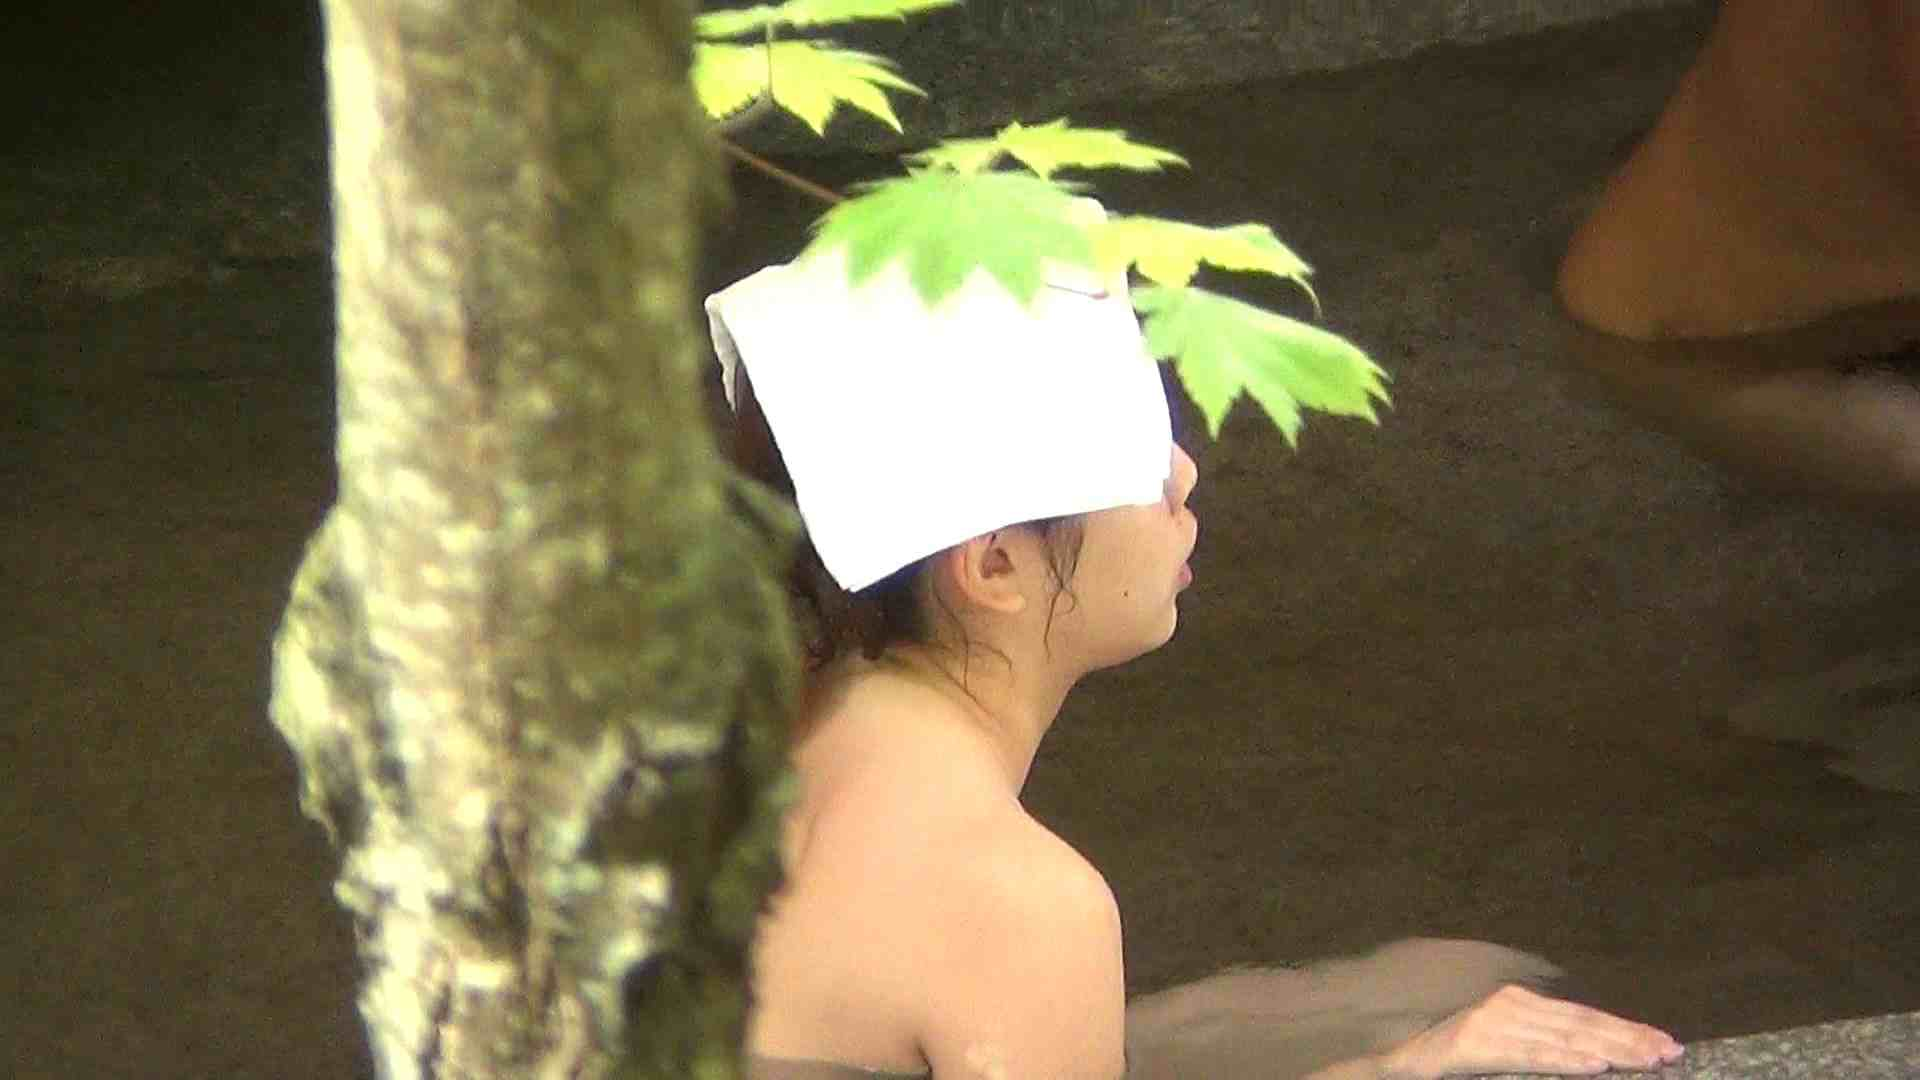 Aquaな露天風呂Vol.243 OLのエロ生活   露天風呂  57連発 16